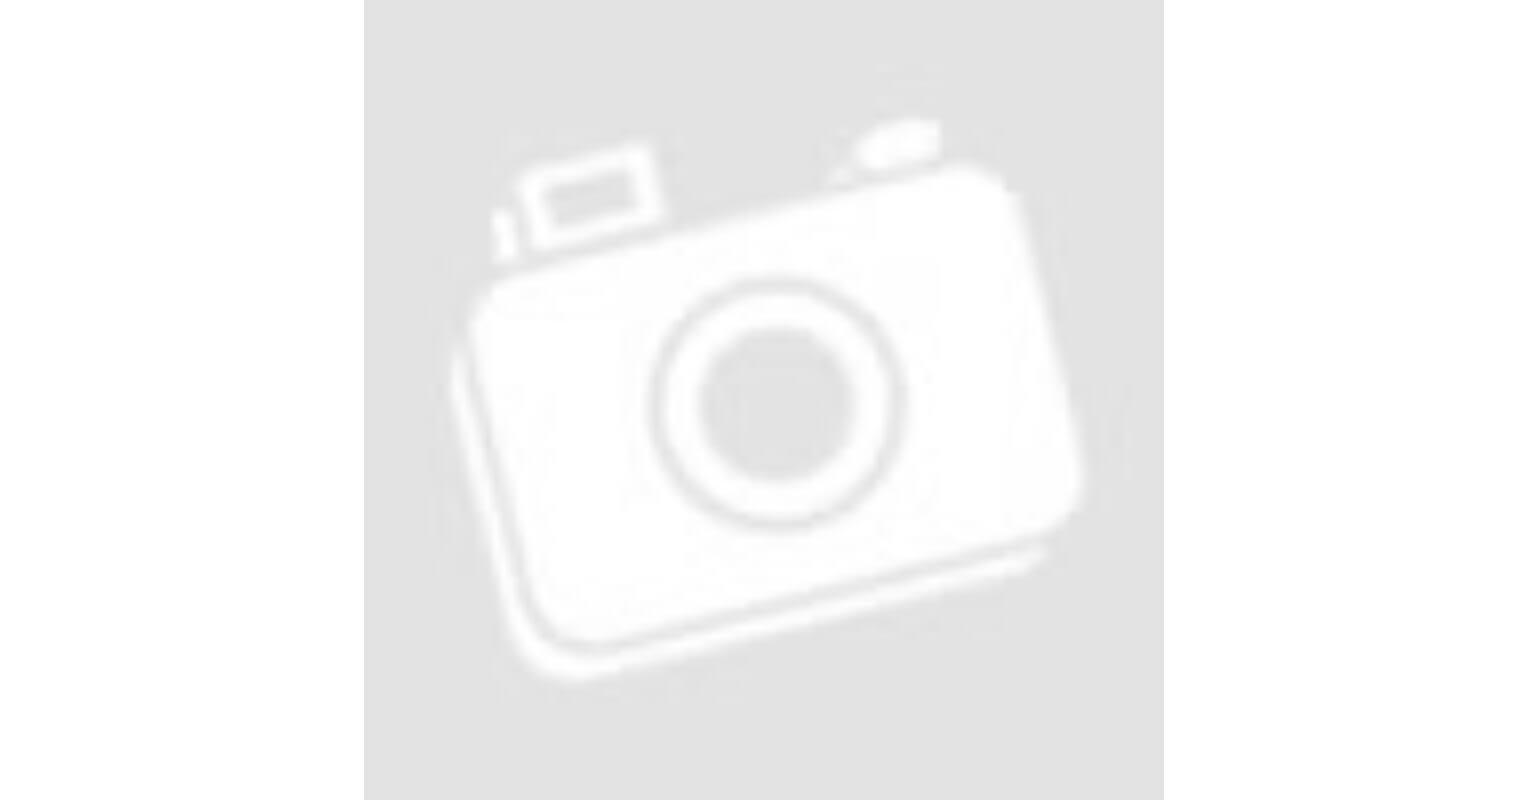 Fogantyú Bialetti Brikka kávéfőzőhöz